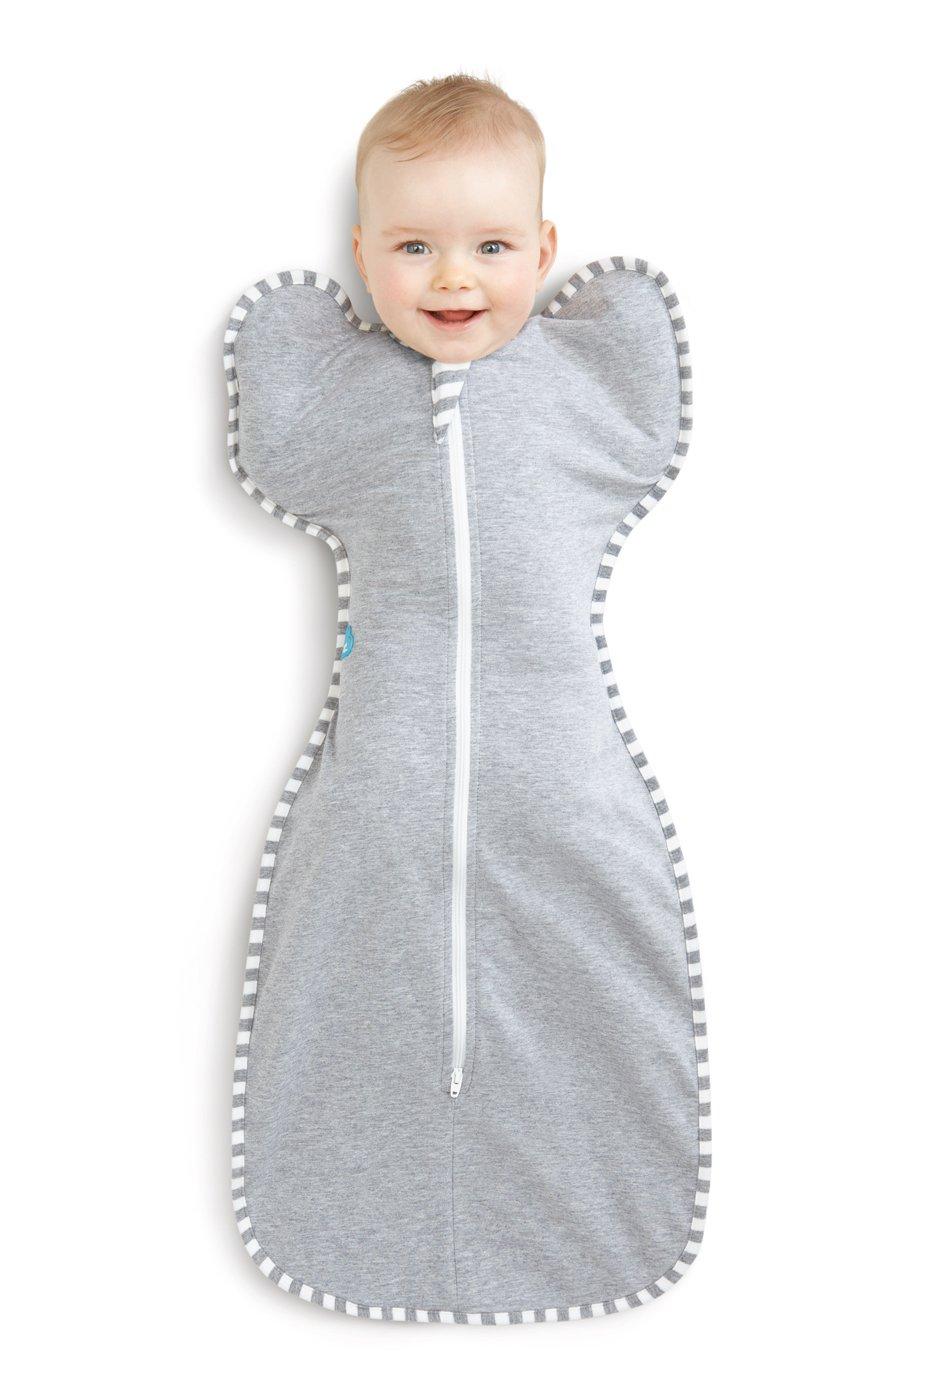 11 Newborn must have baby items